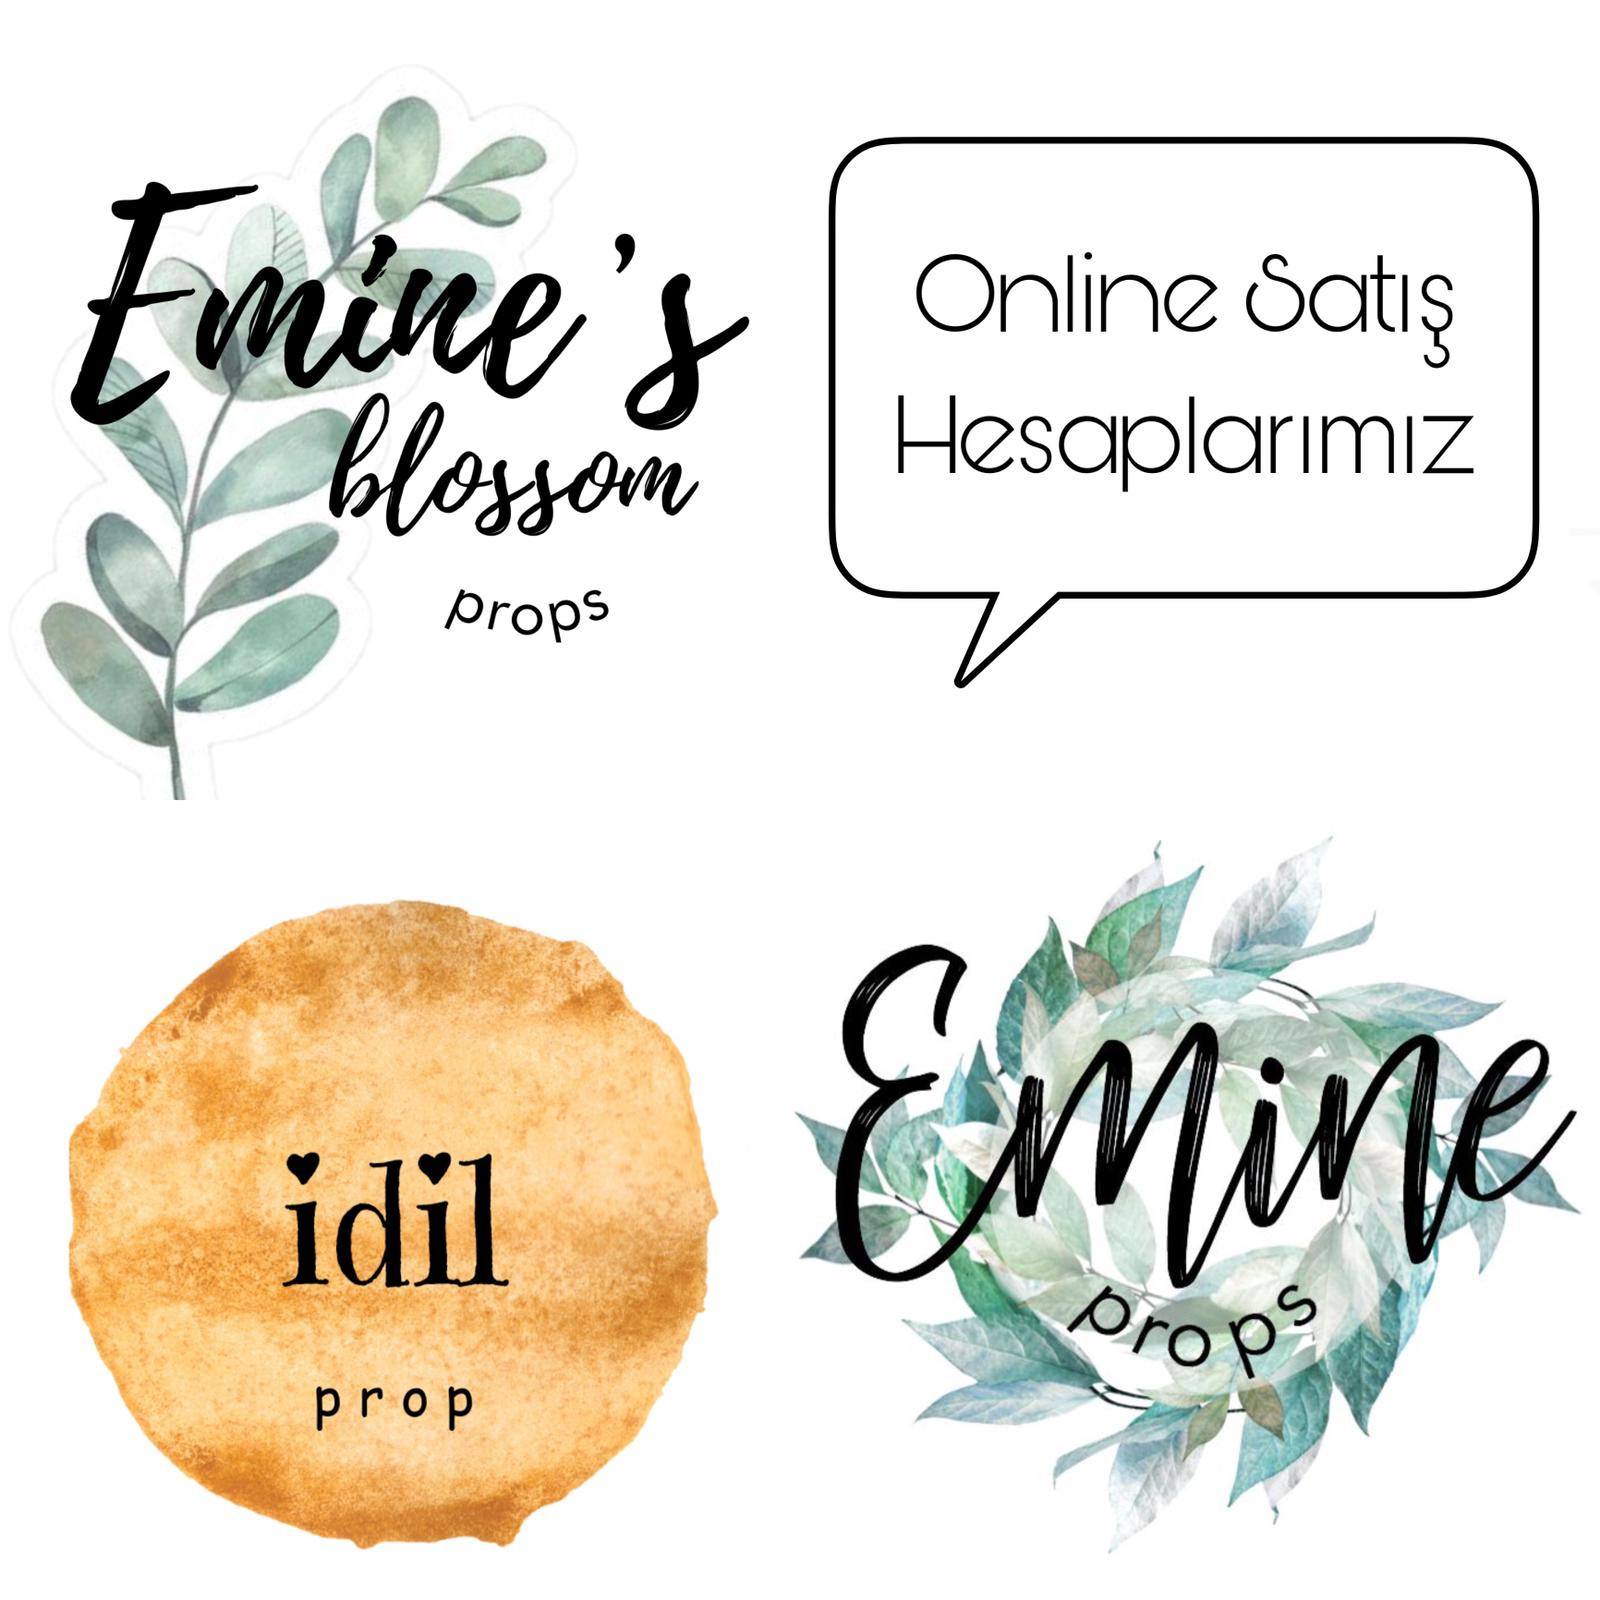 emineprops&idilprop&emineblossomprops